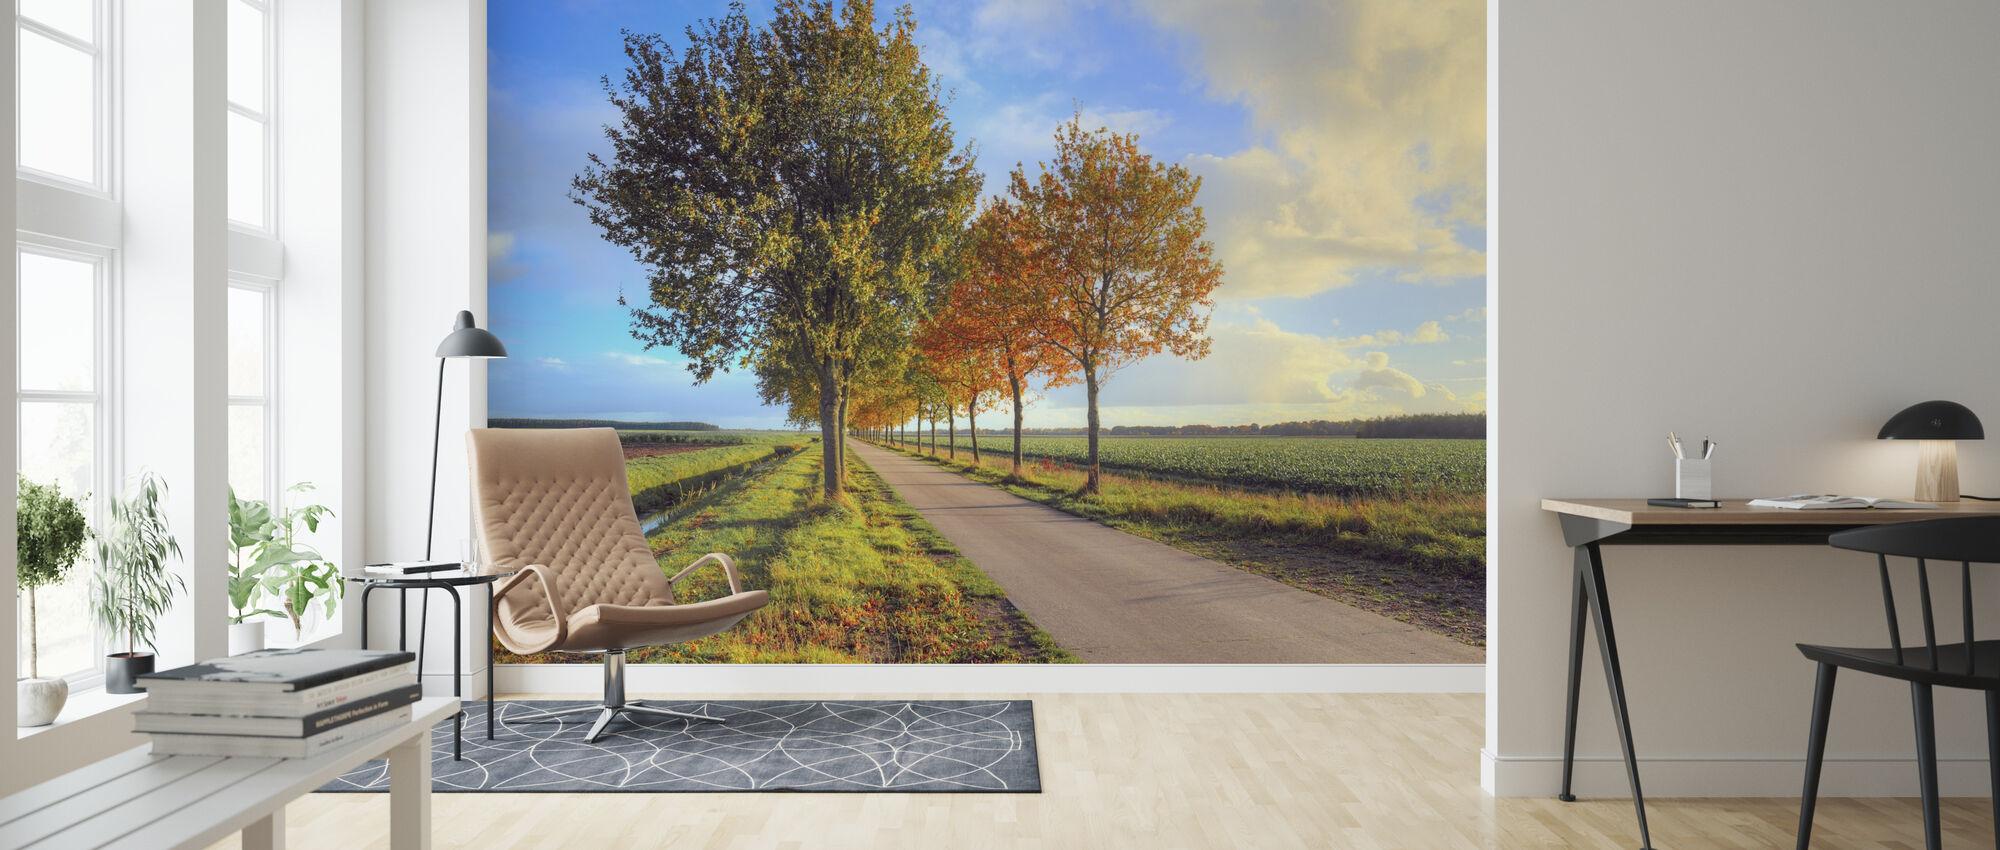 Bright Road Landscape - Wallpaper - Living Room